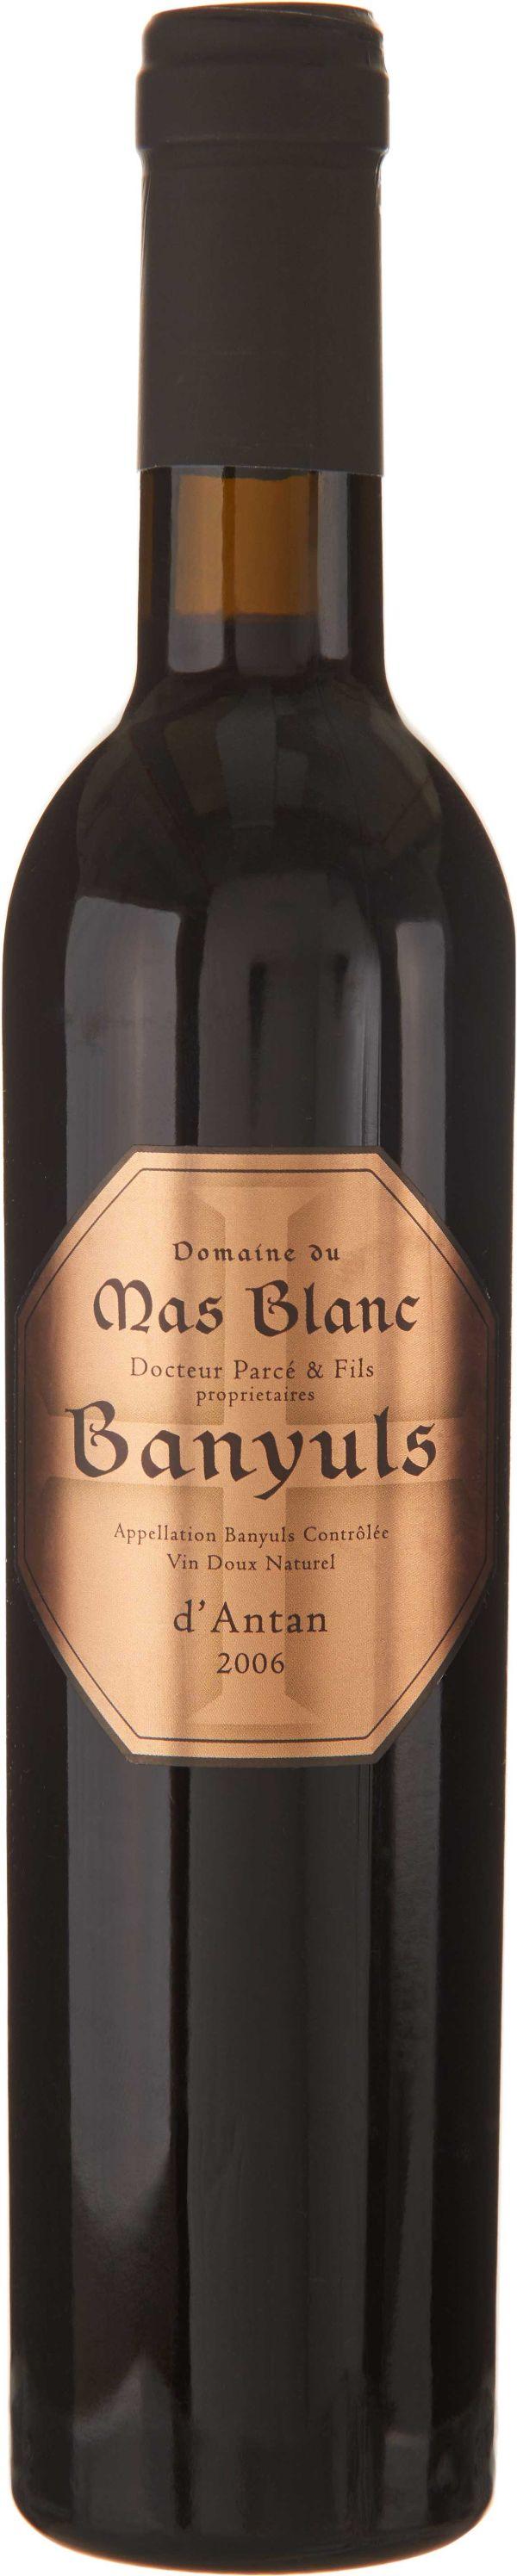 Domaine Du Mas Blanc Banyuls D'Antan 2006